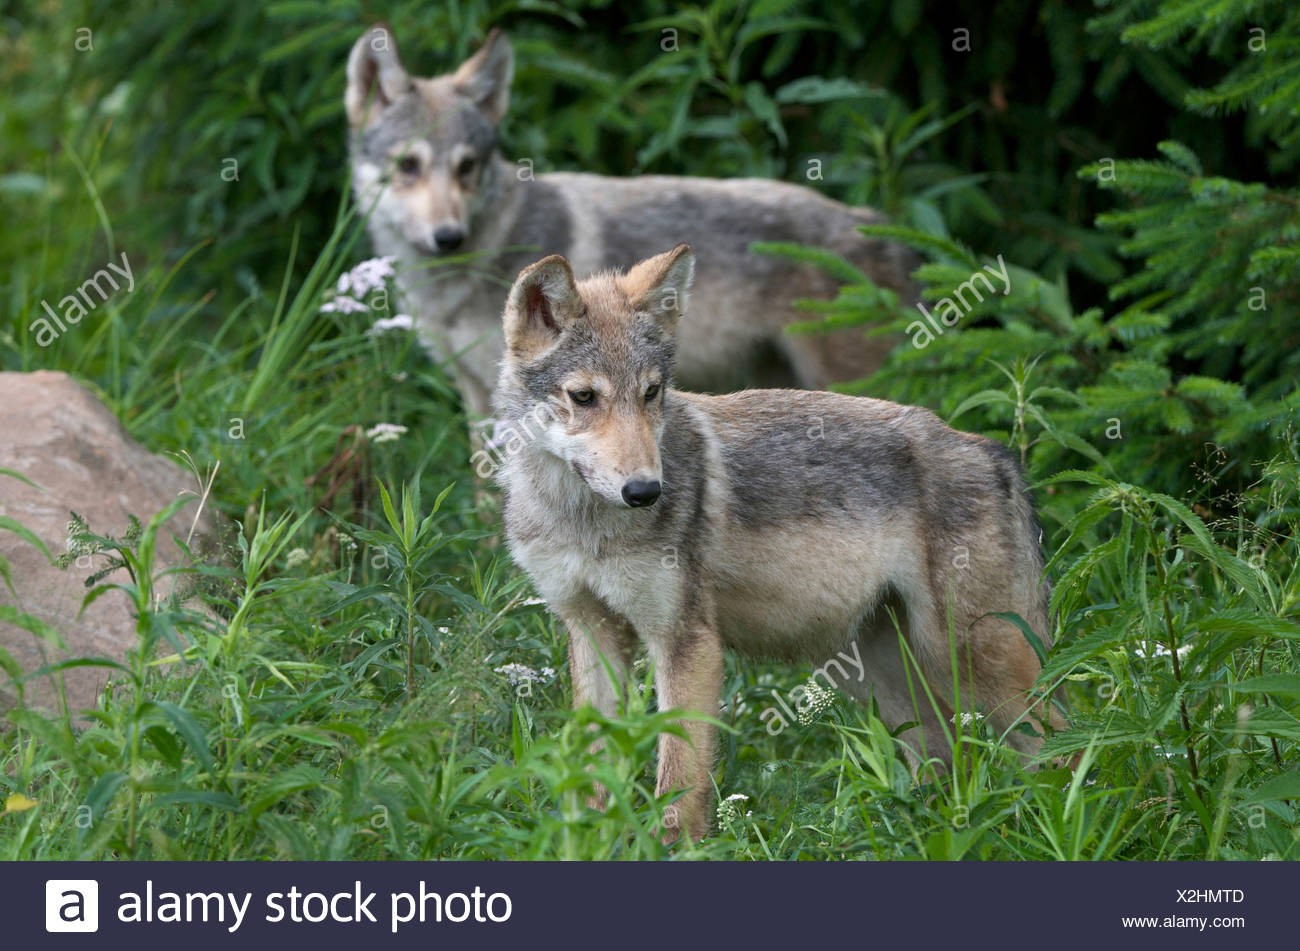 Wolf Pups (Canus lupus) in Boundary Waters Canoe Area, Minnesota, U.S.A, North America - Stock Image